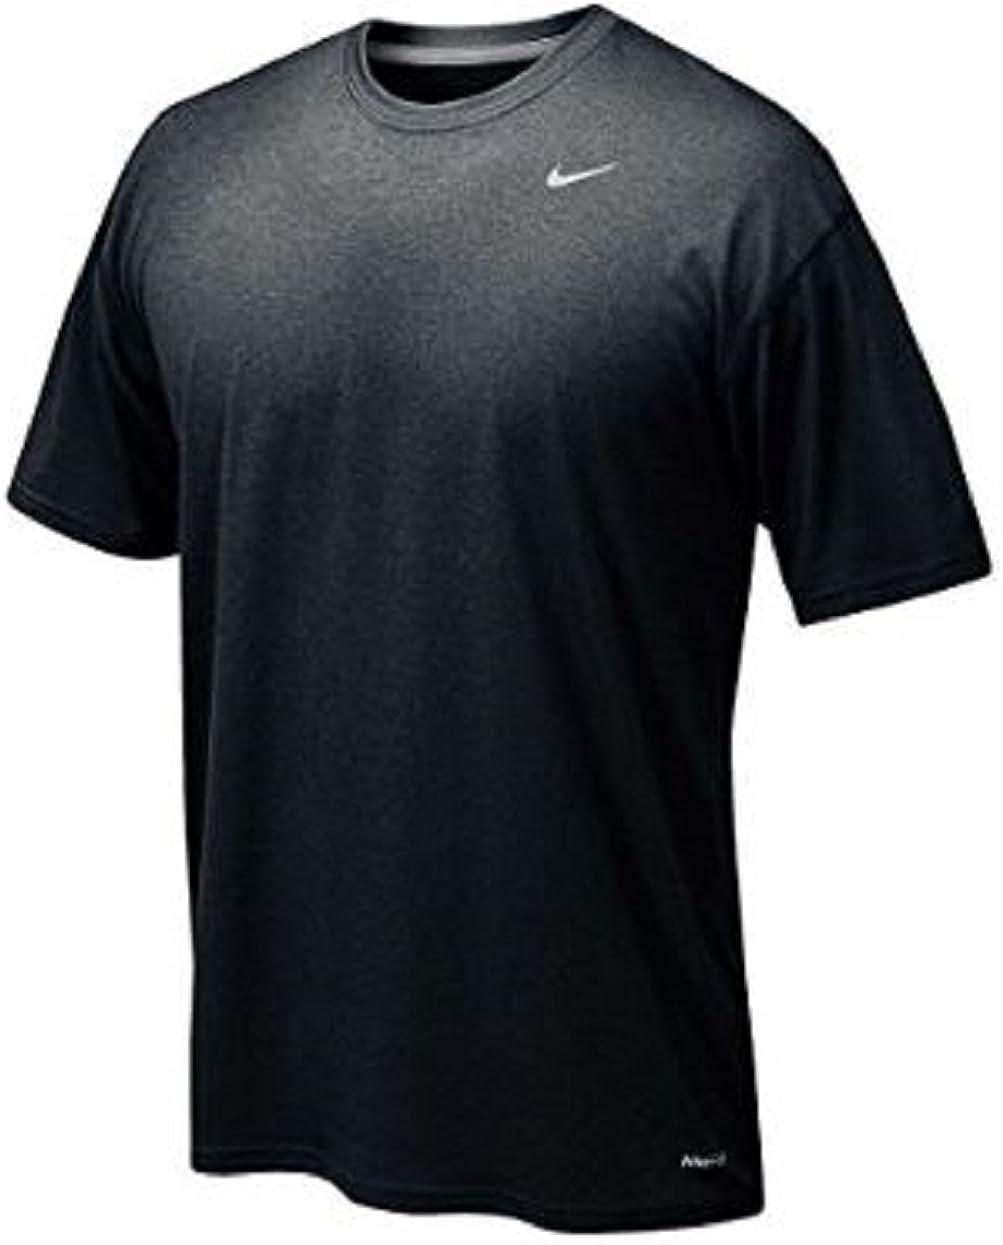 Nike Youth Legend Short Sleeve Tee (YM, Black)